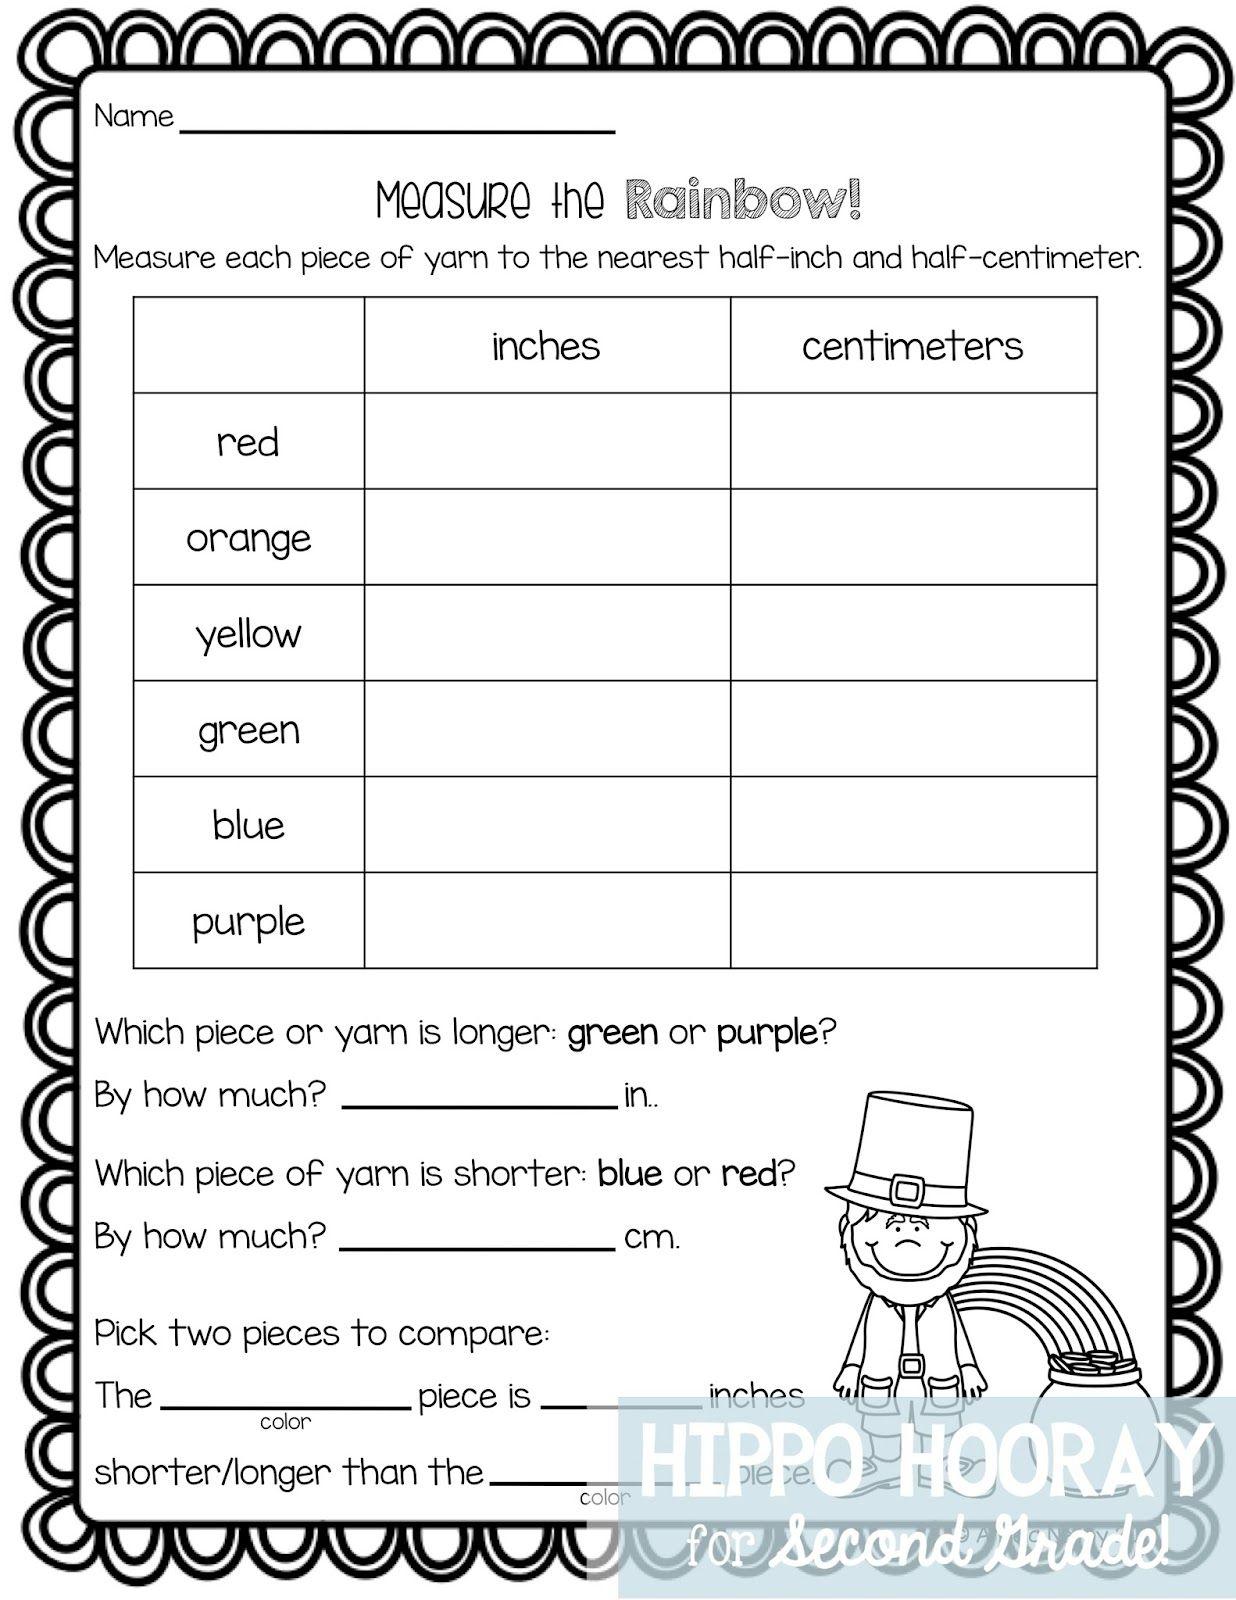 St Patrick S Day Math Freebie Measurement Worksheets 2nd Grade Math 2nd Grade Math Worksheets [ 1600 x 1236 Pixel ]